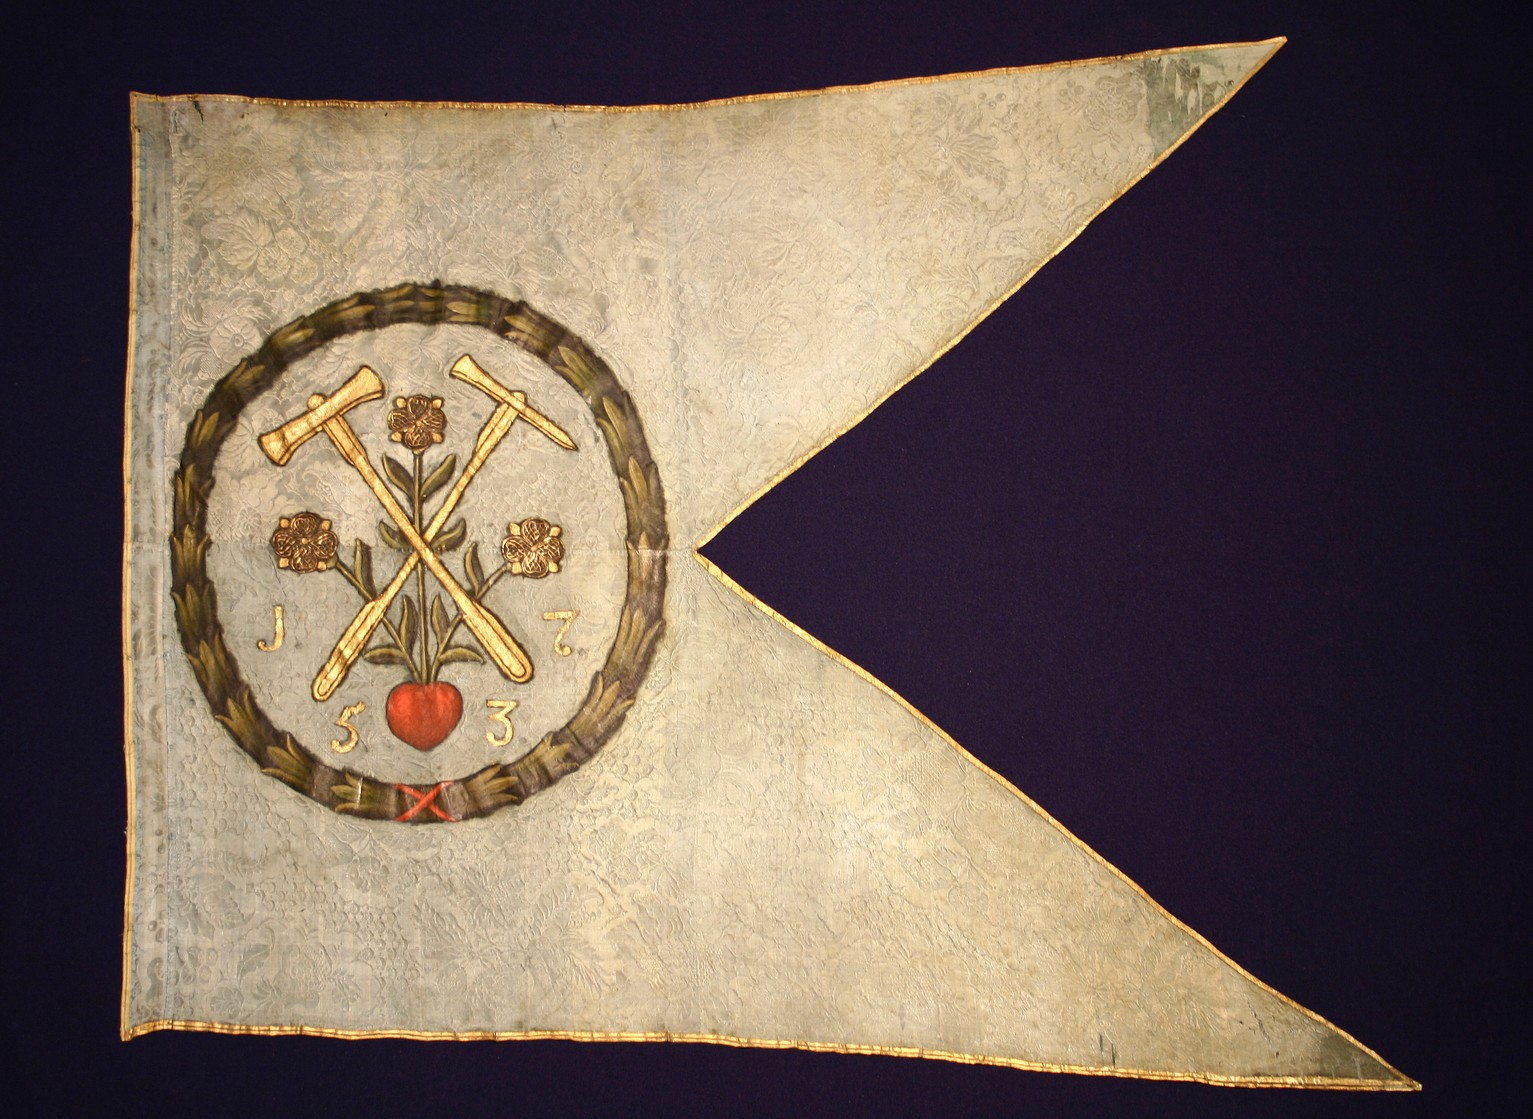 zastava-roznavskeho-banickeho-cechu-1753-foto-l-duran